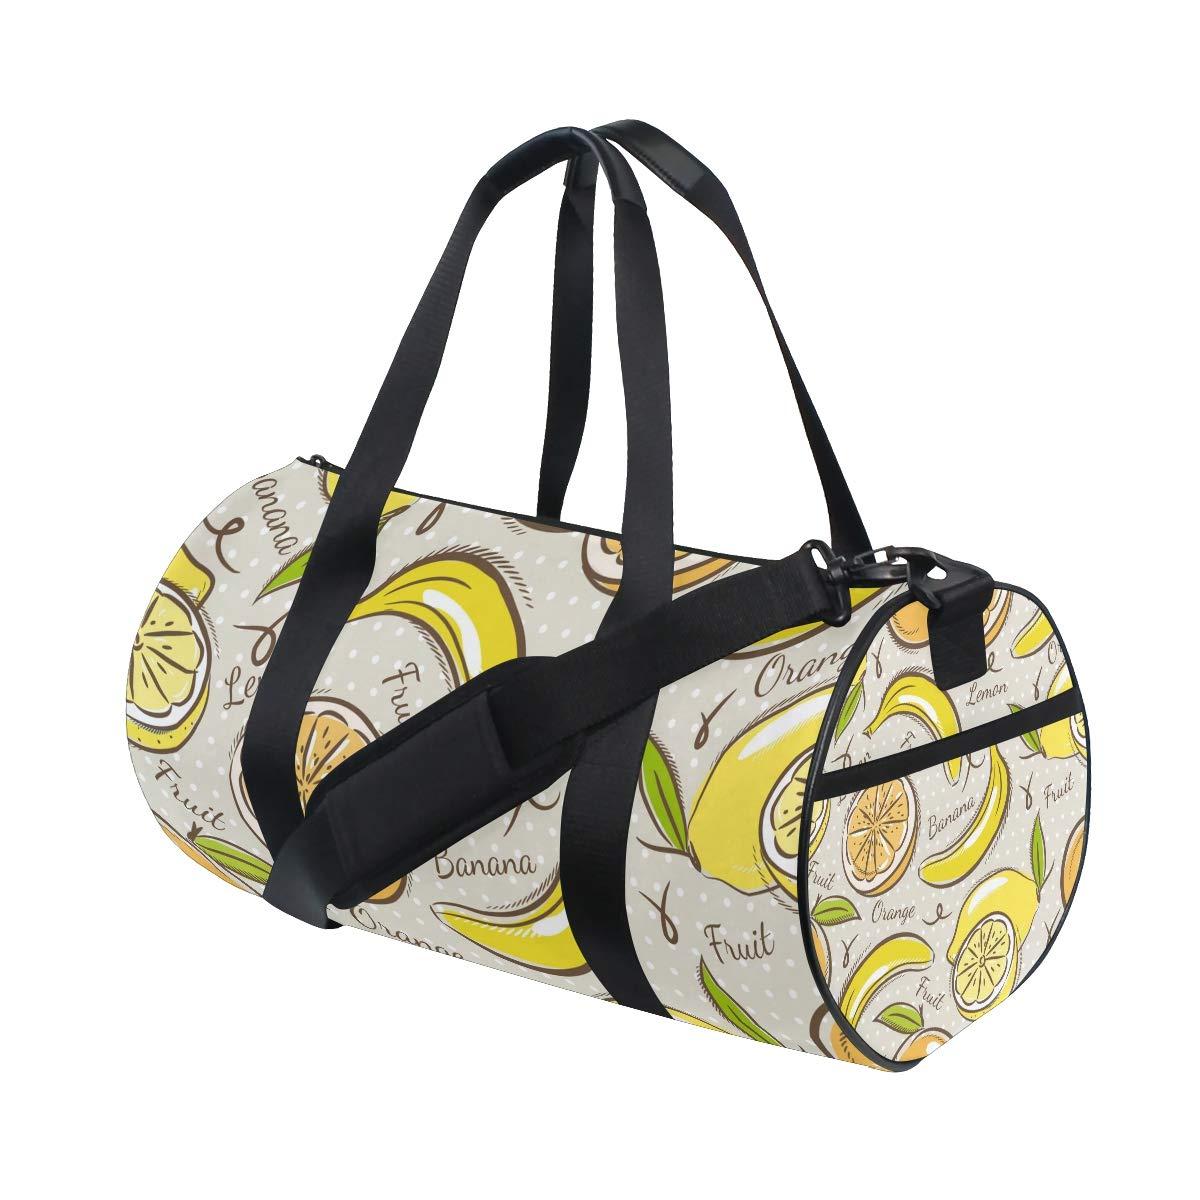 WIHVE Gym Duffel Bag Bananas Oranges And Lemons Sports Lightweight Canvas Travel Luggage Bag